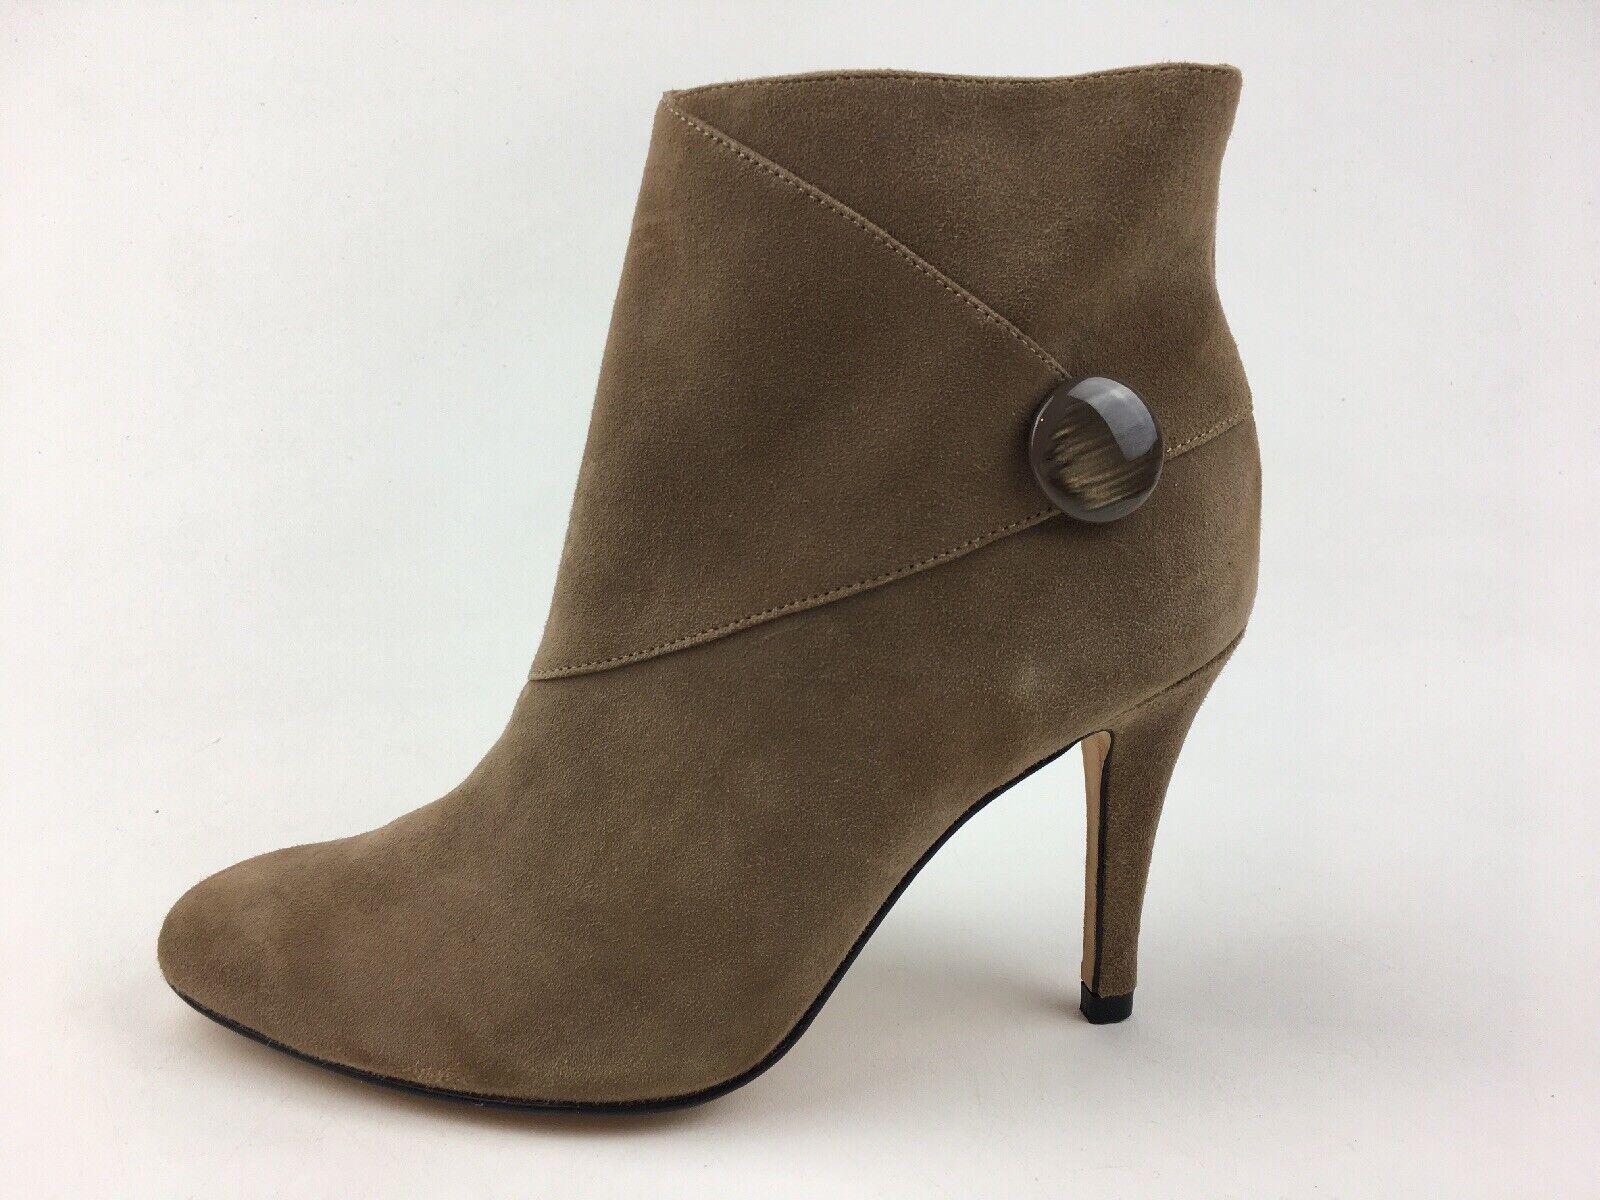 Vaneli Casperia Women's Heel Ankle Booties Size 5.5M, Truffle Suede 2168